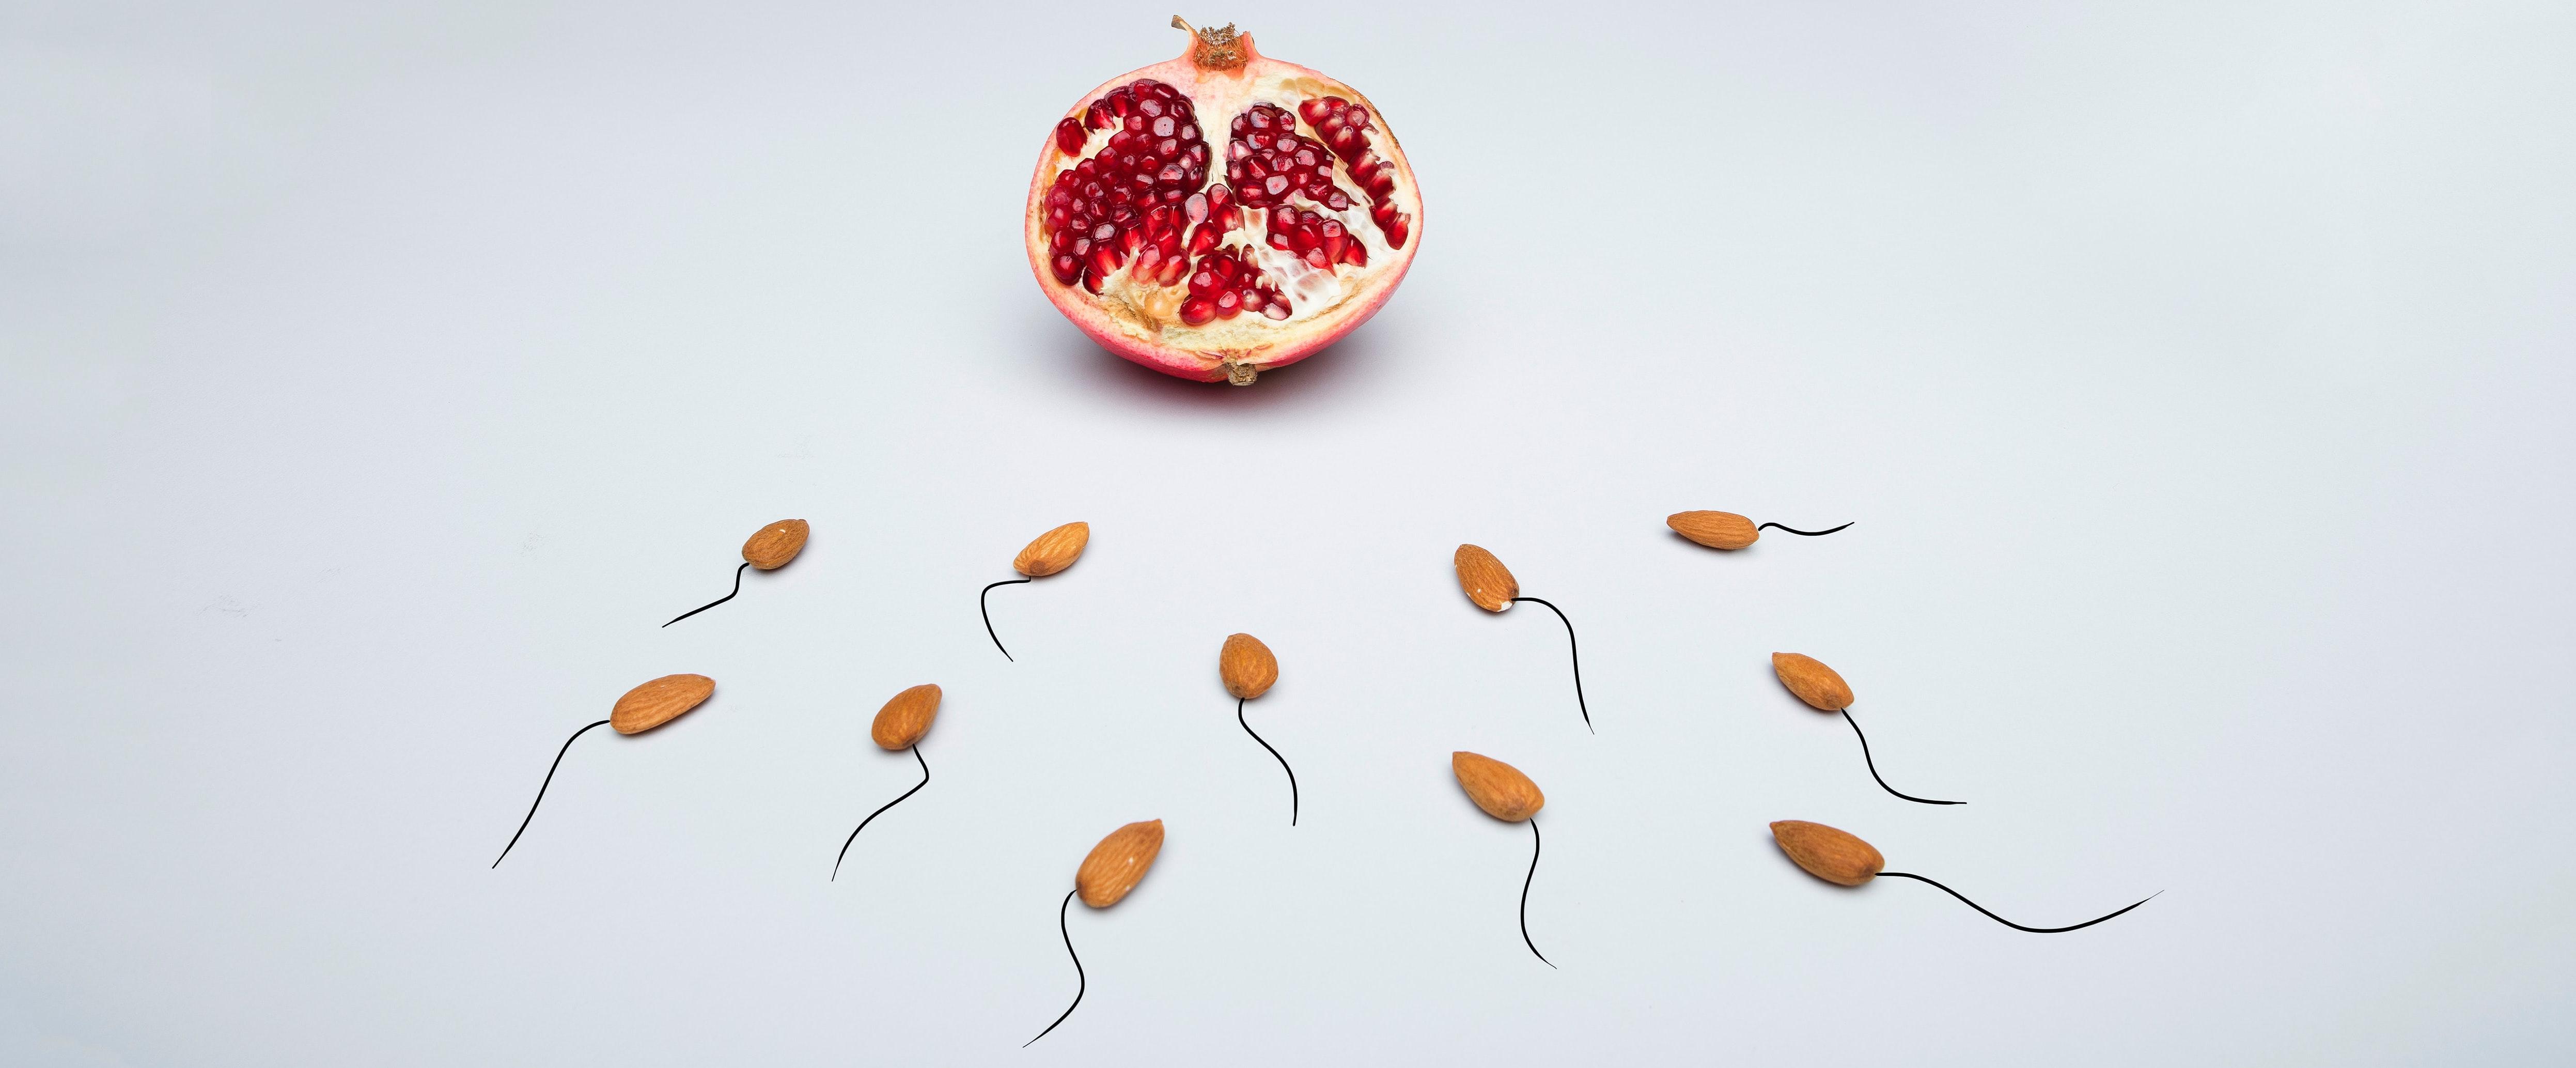 Vruchtbaarheidscrisis: Mannen hebben helft minder sperma